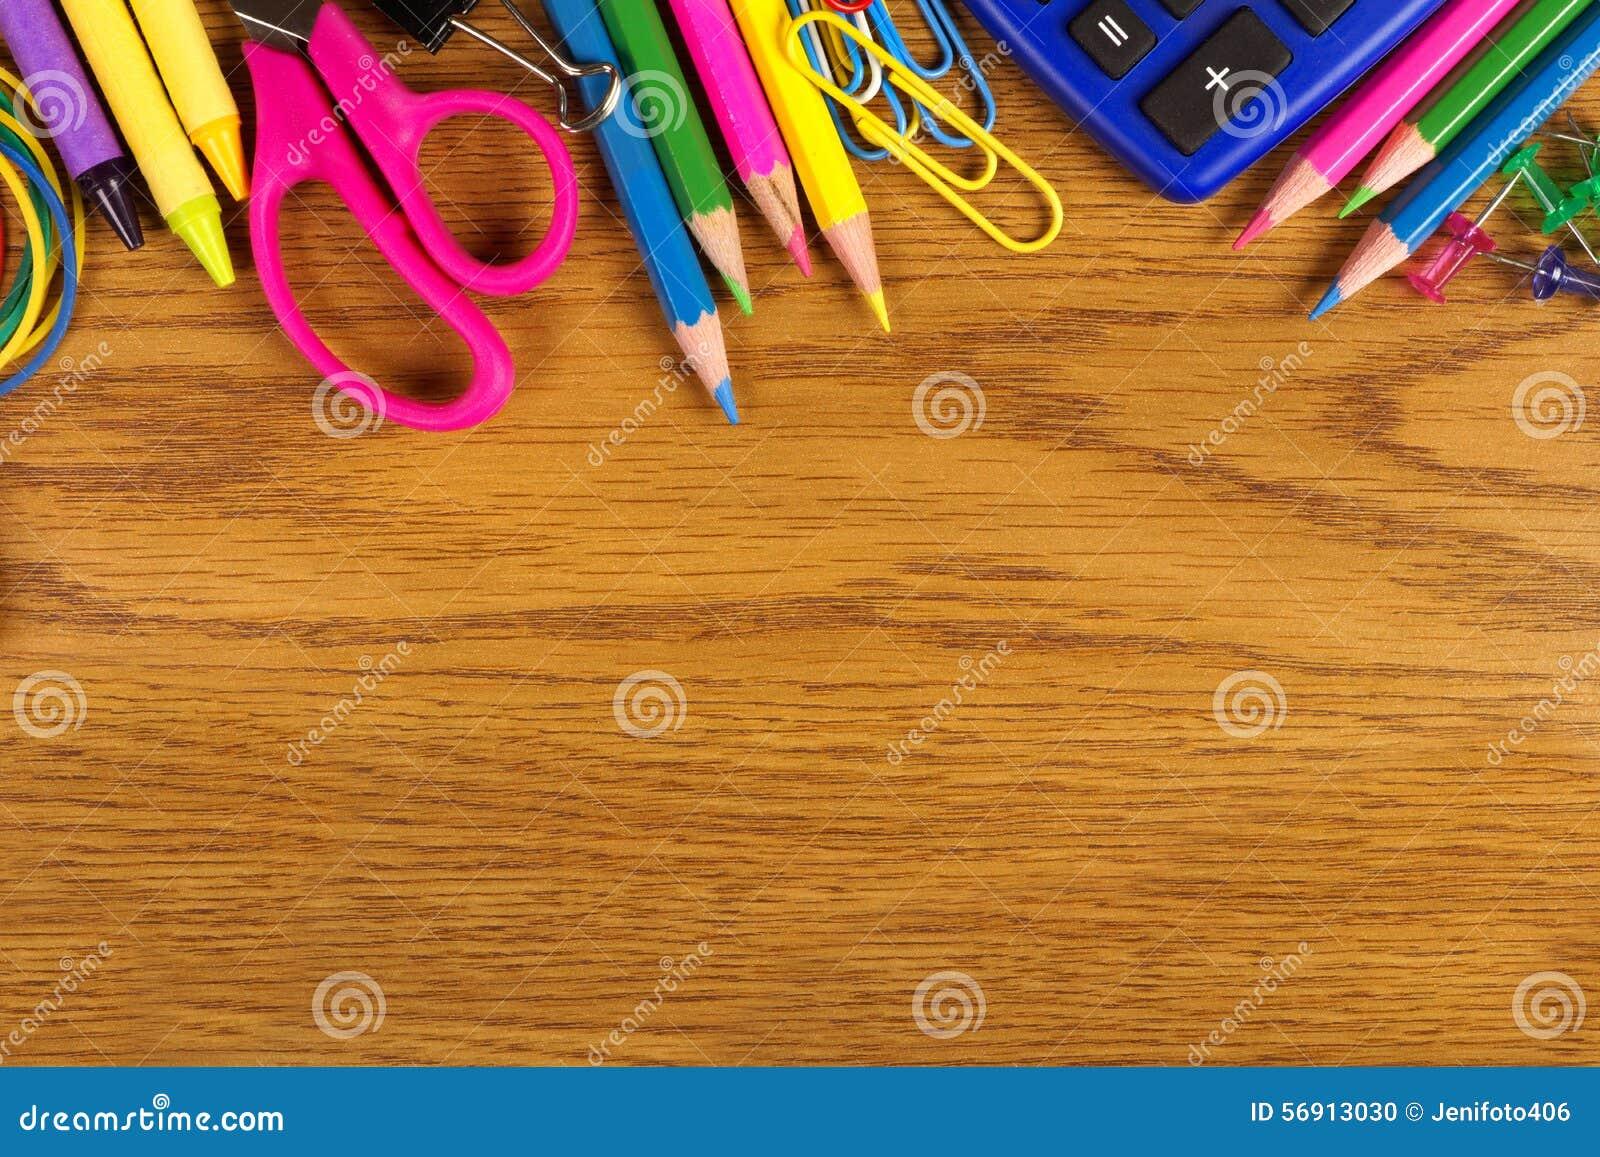 school desk background - photo #32